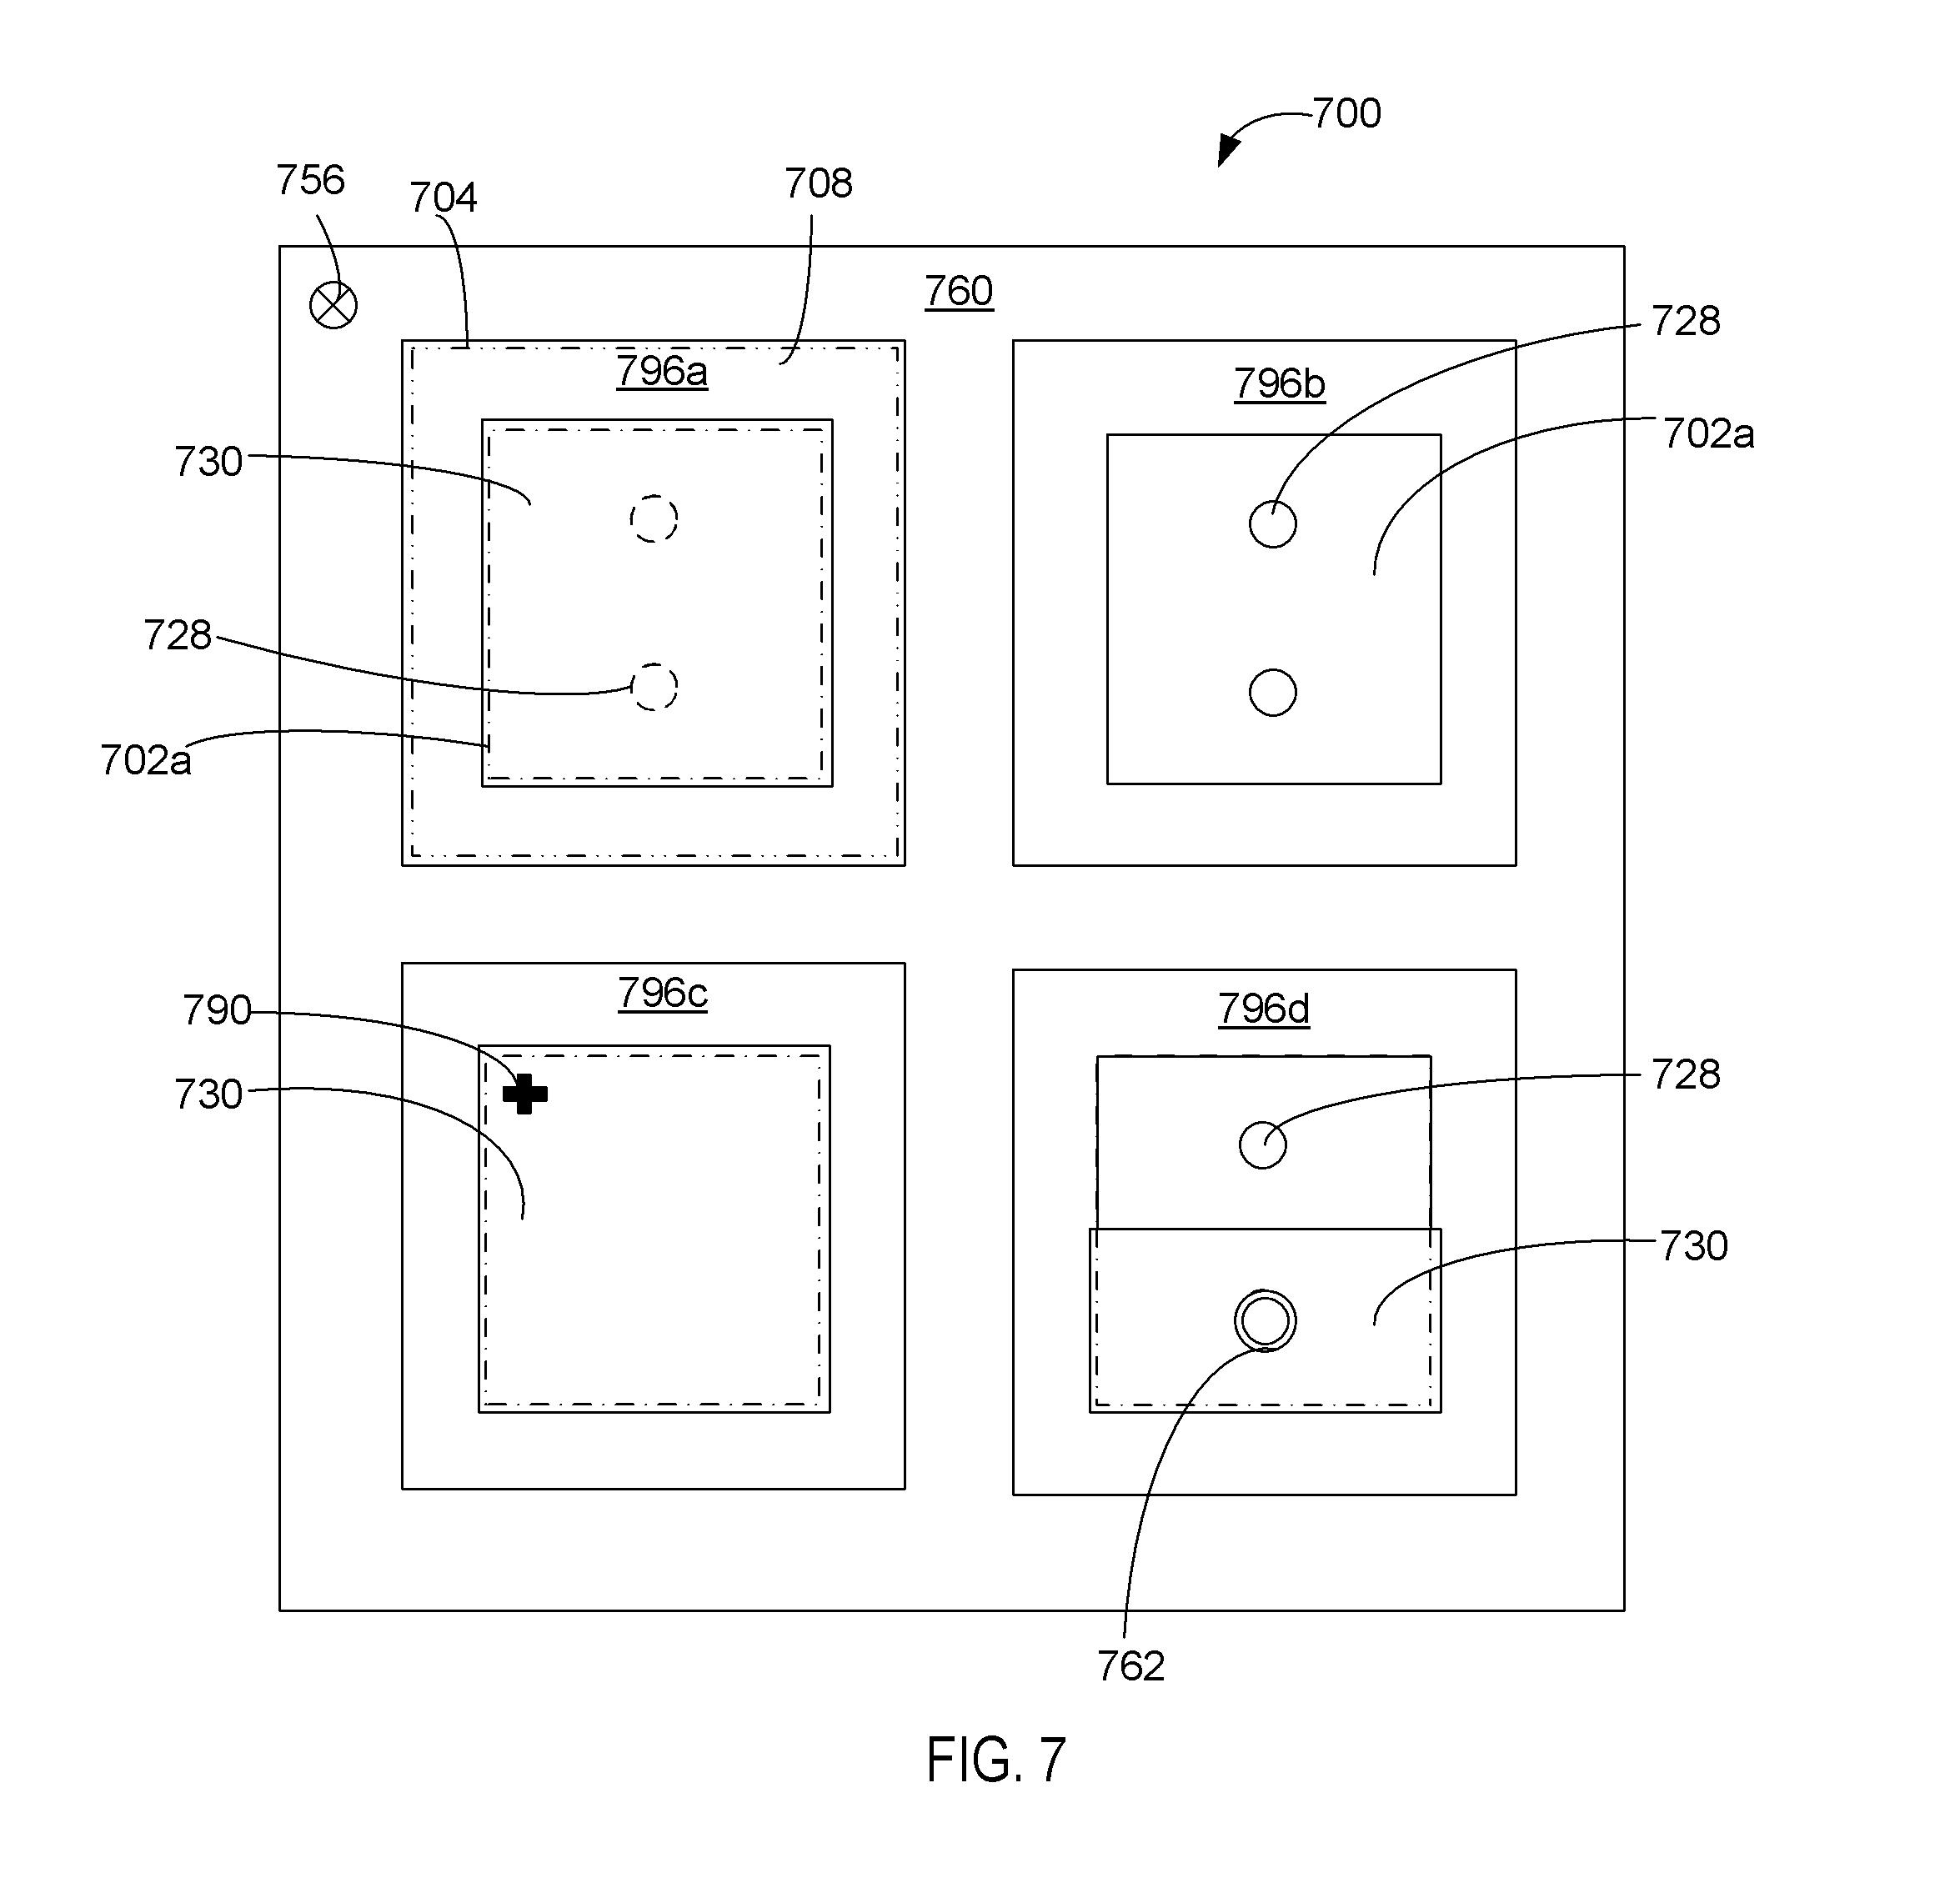 Umb Wiring Instructions